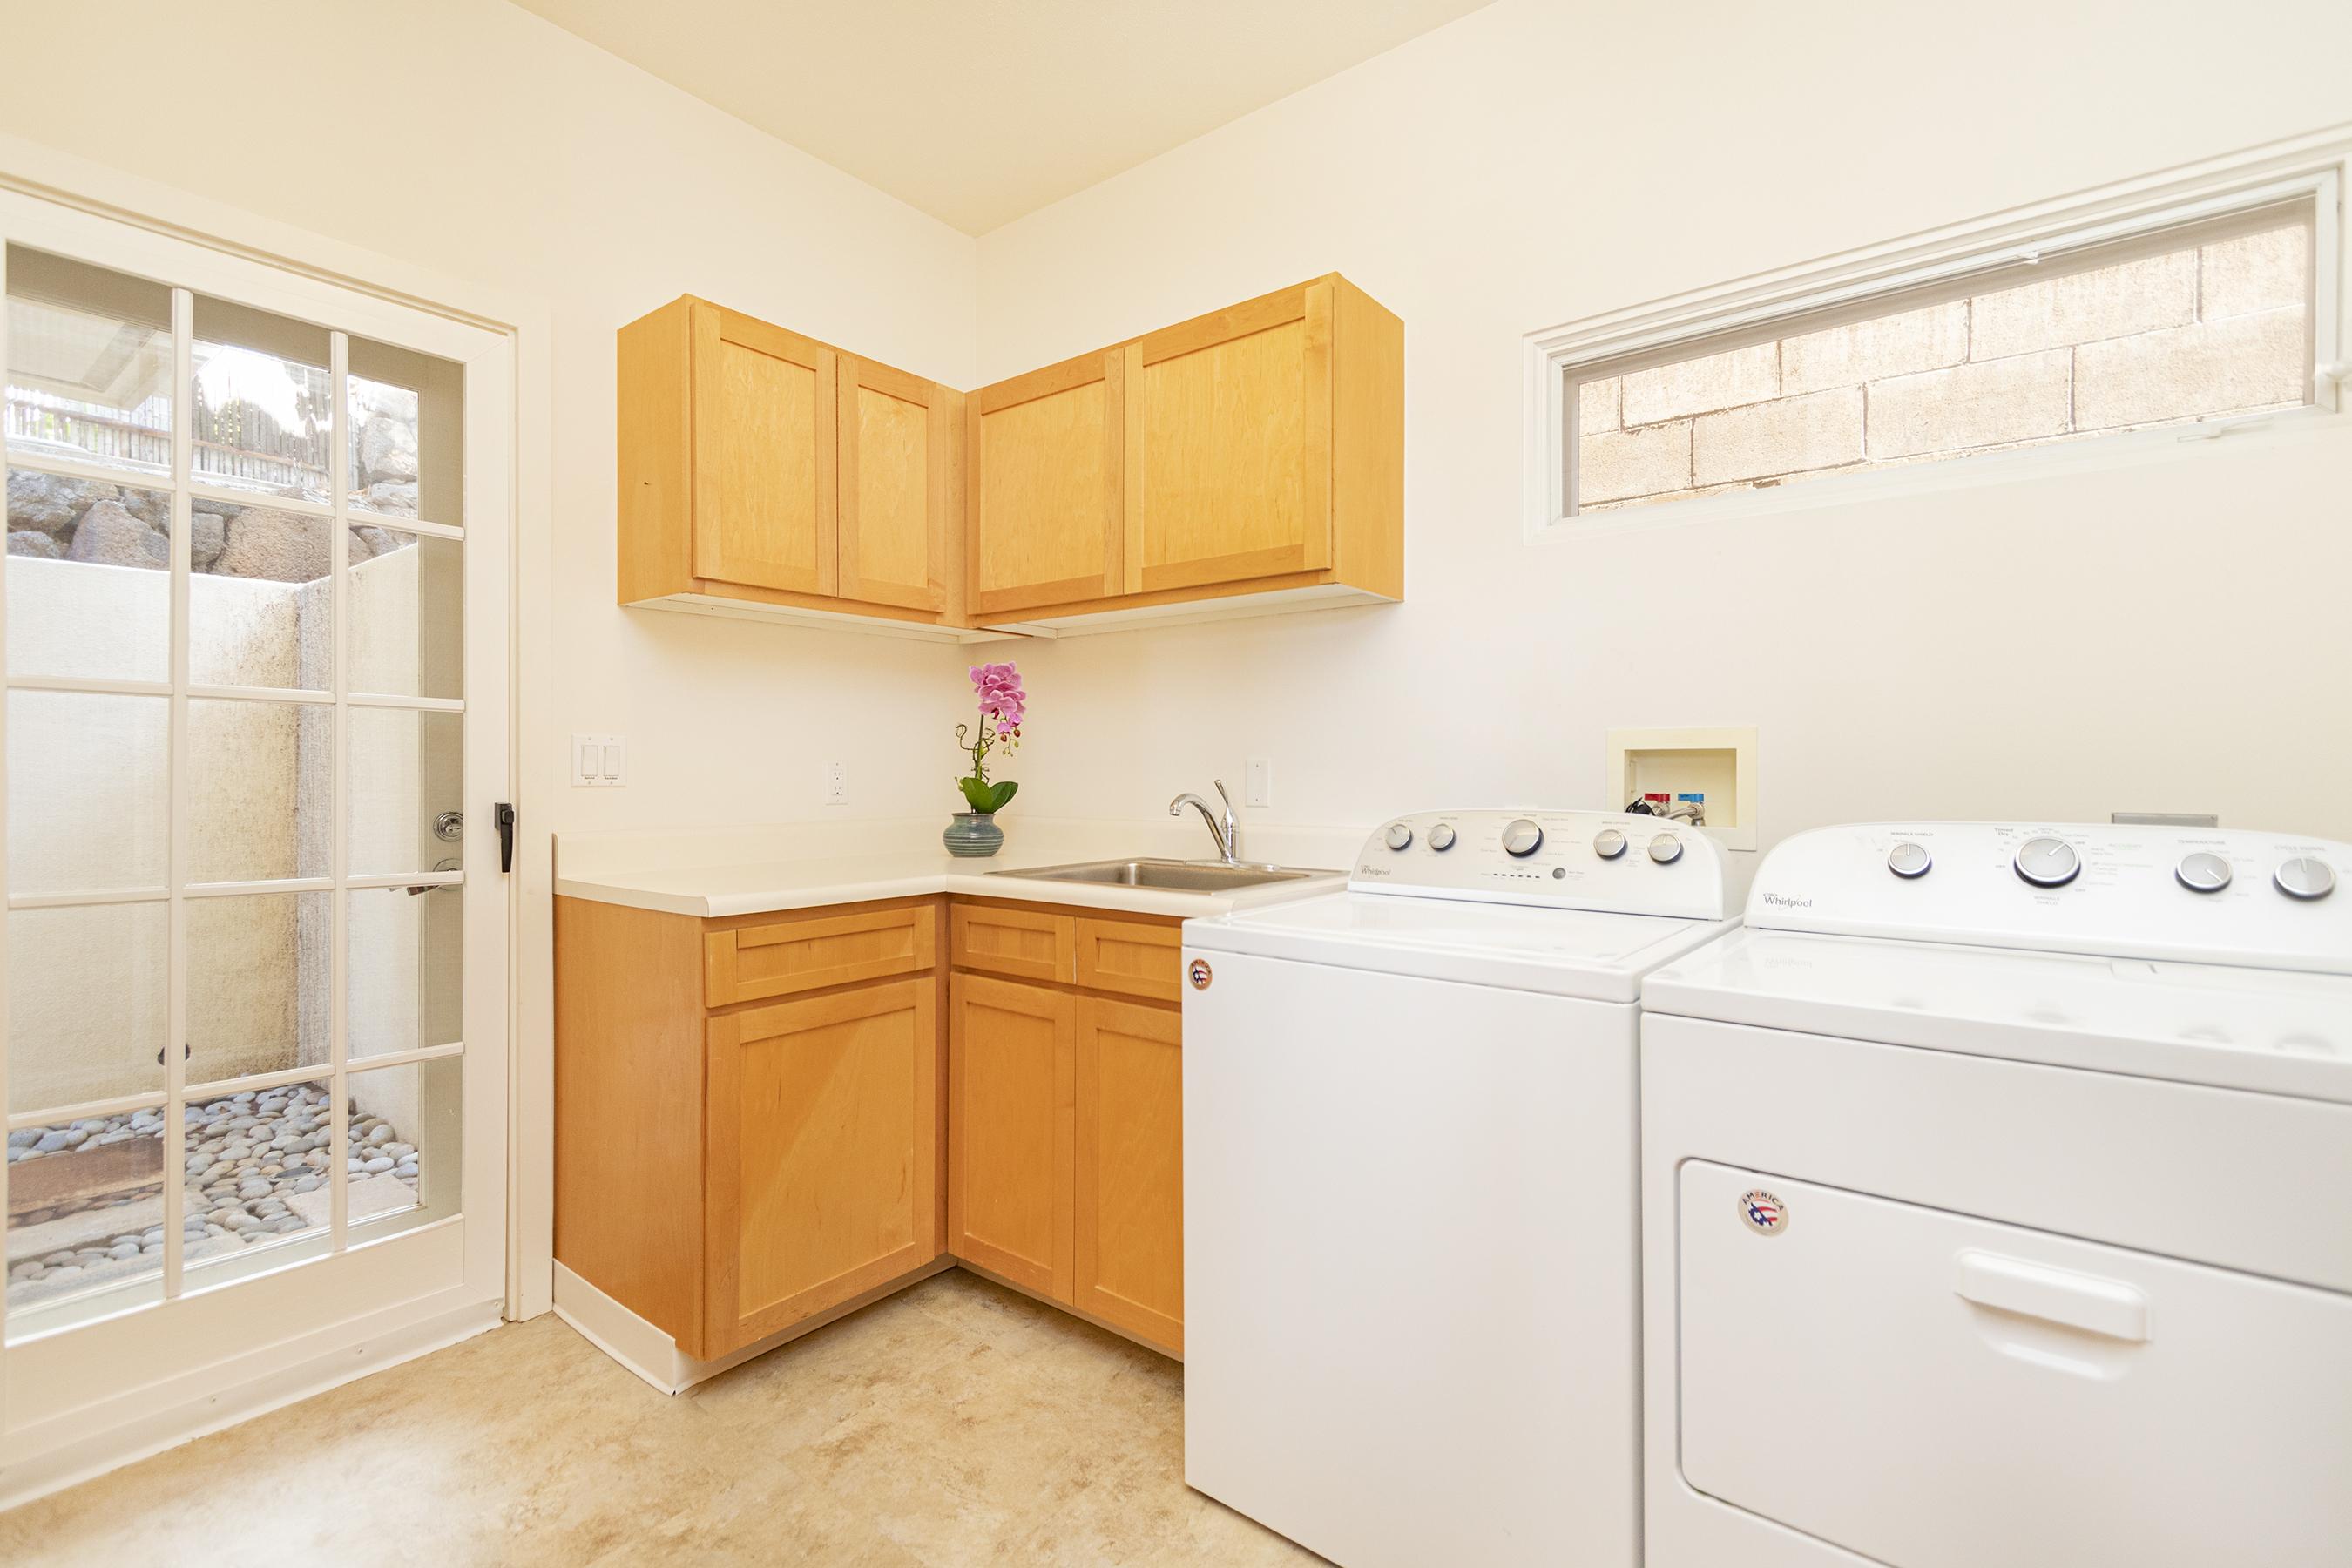 Laundry room at 4323 Kaikoo Place, Honolulu, HI 96816